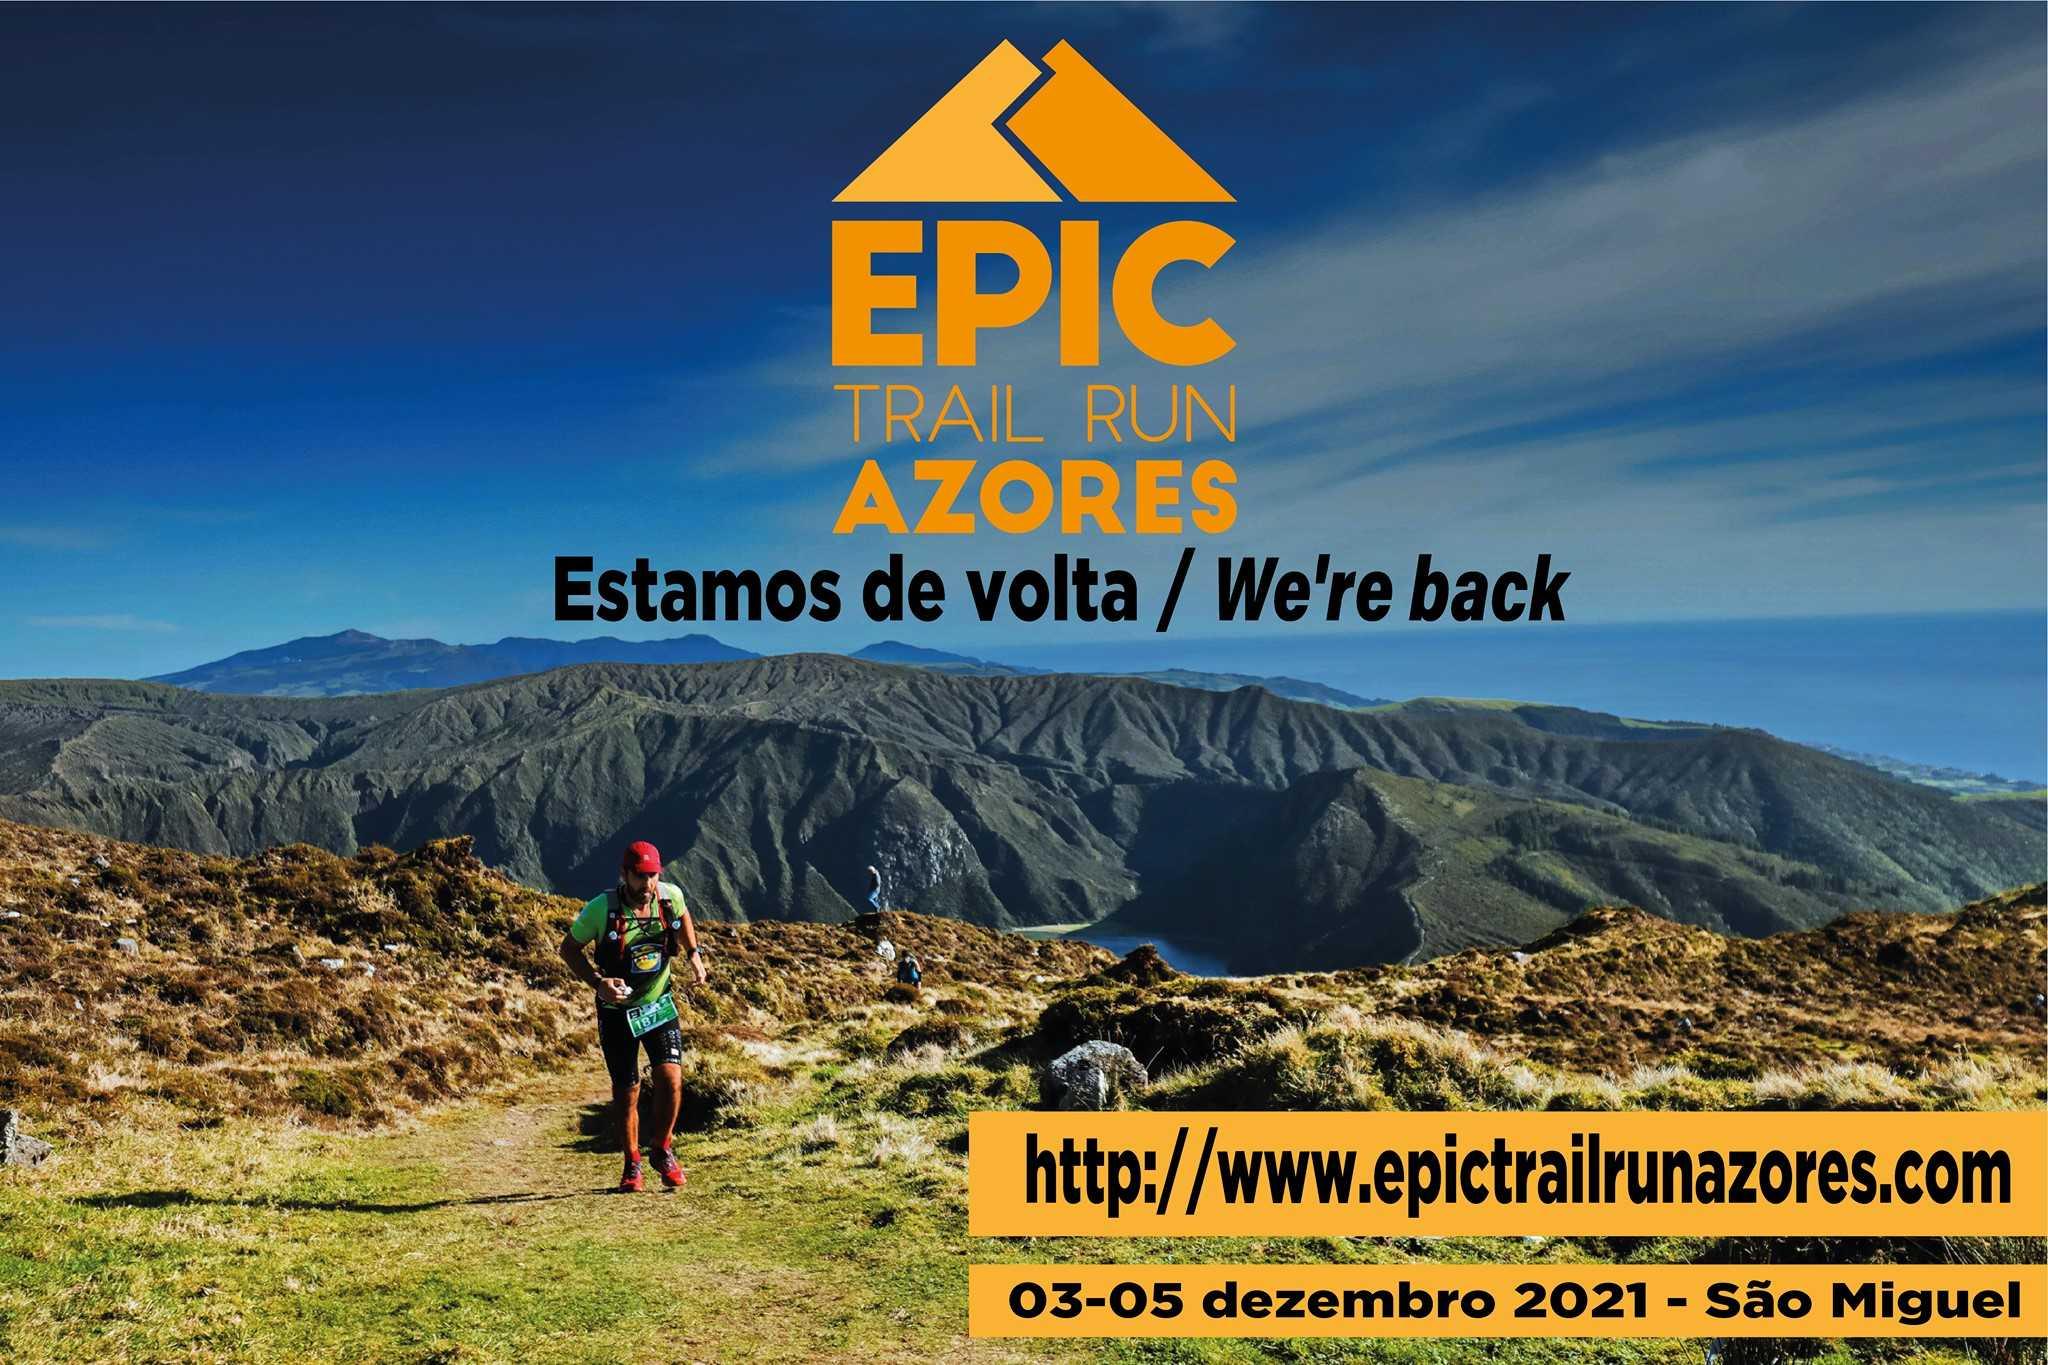 Epic Trail Run Azores 2021